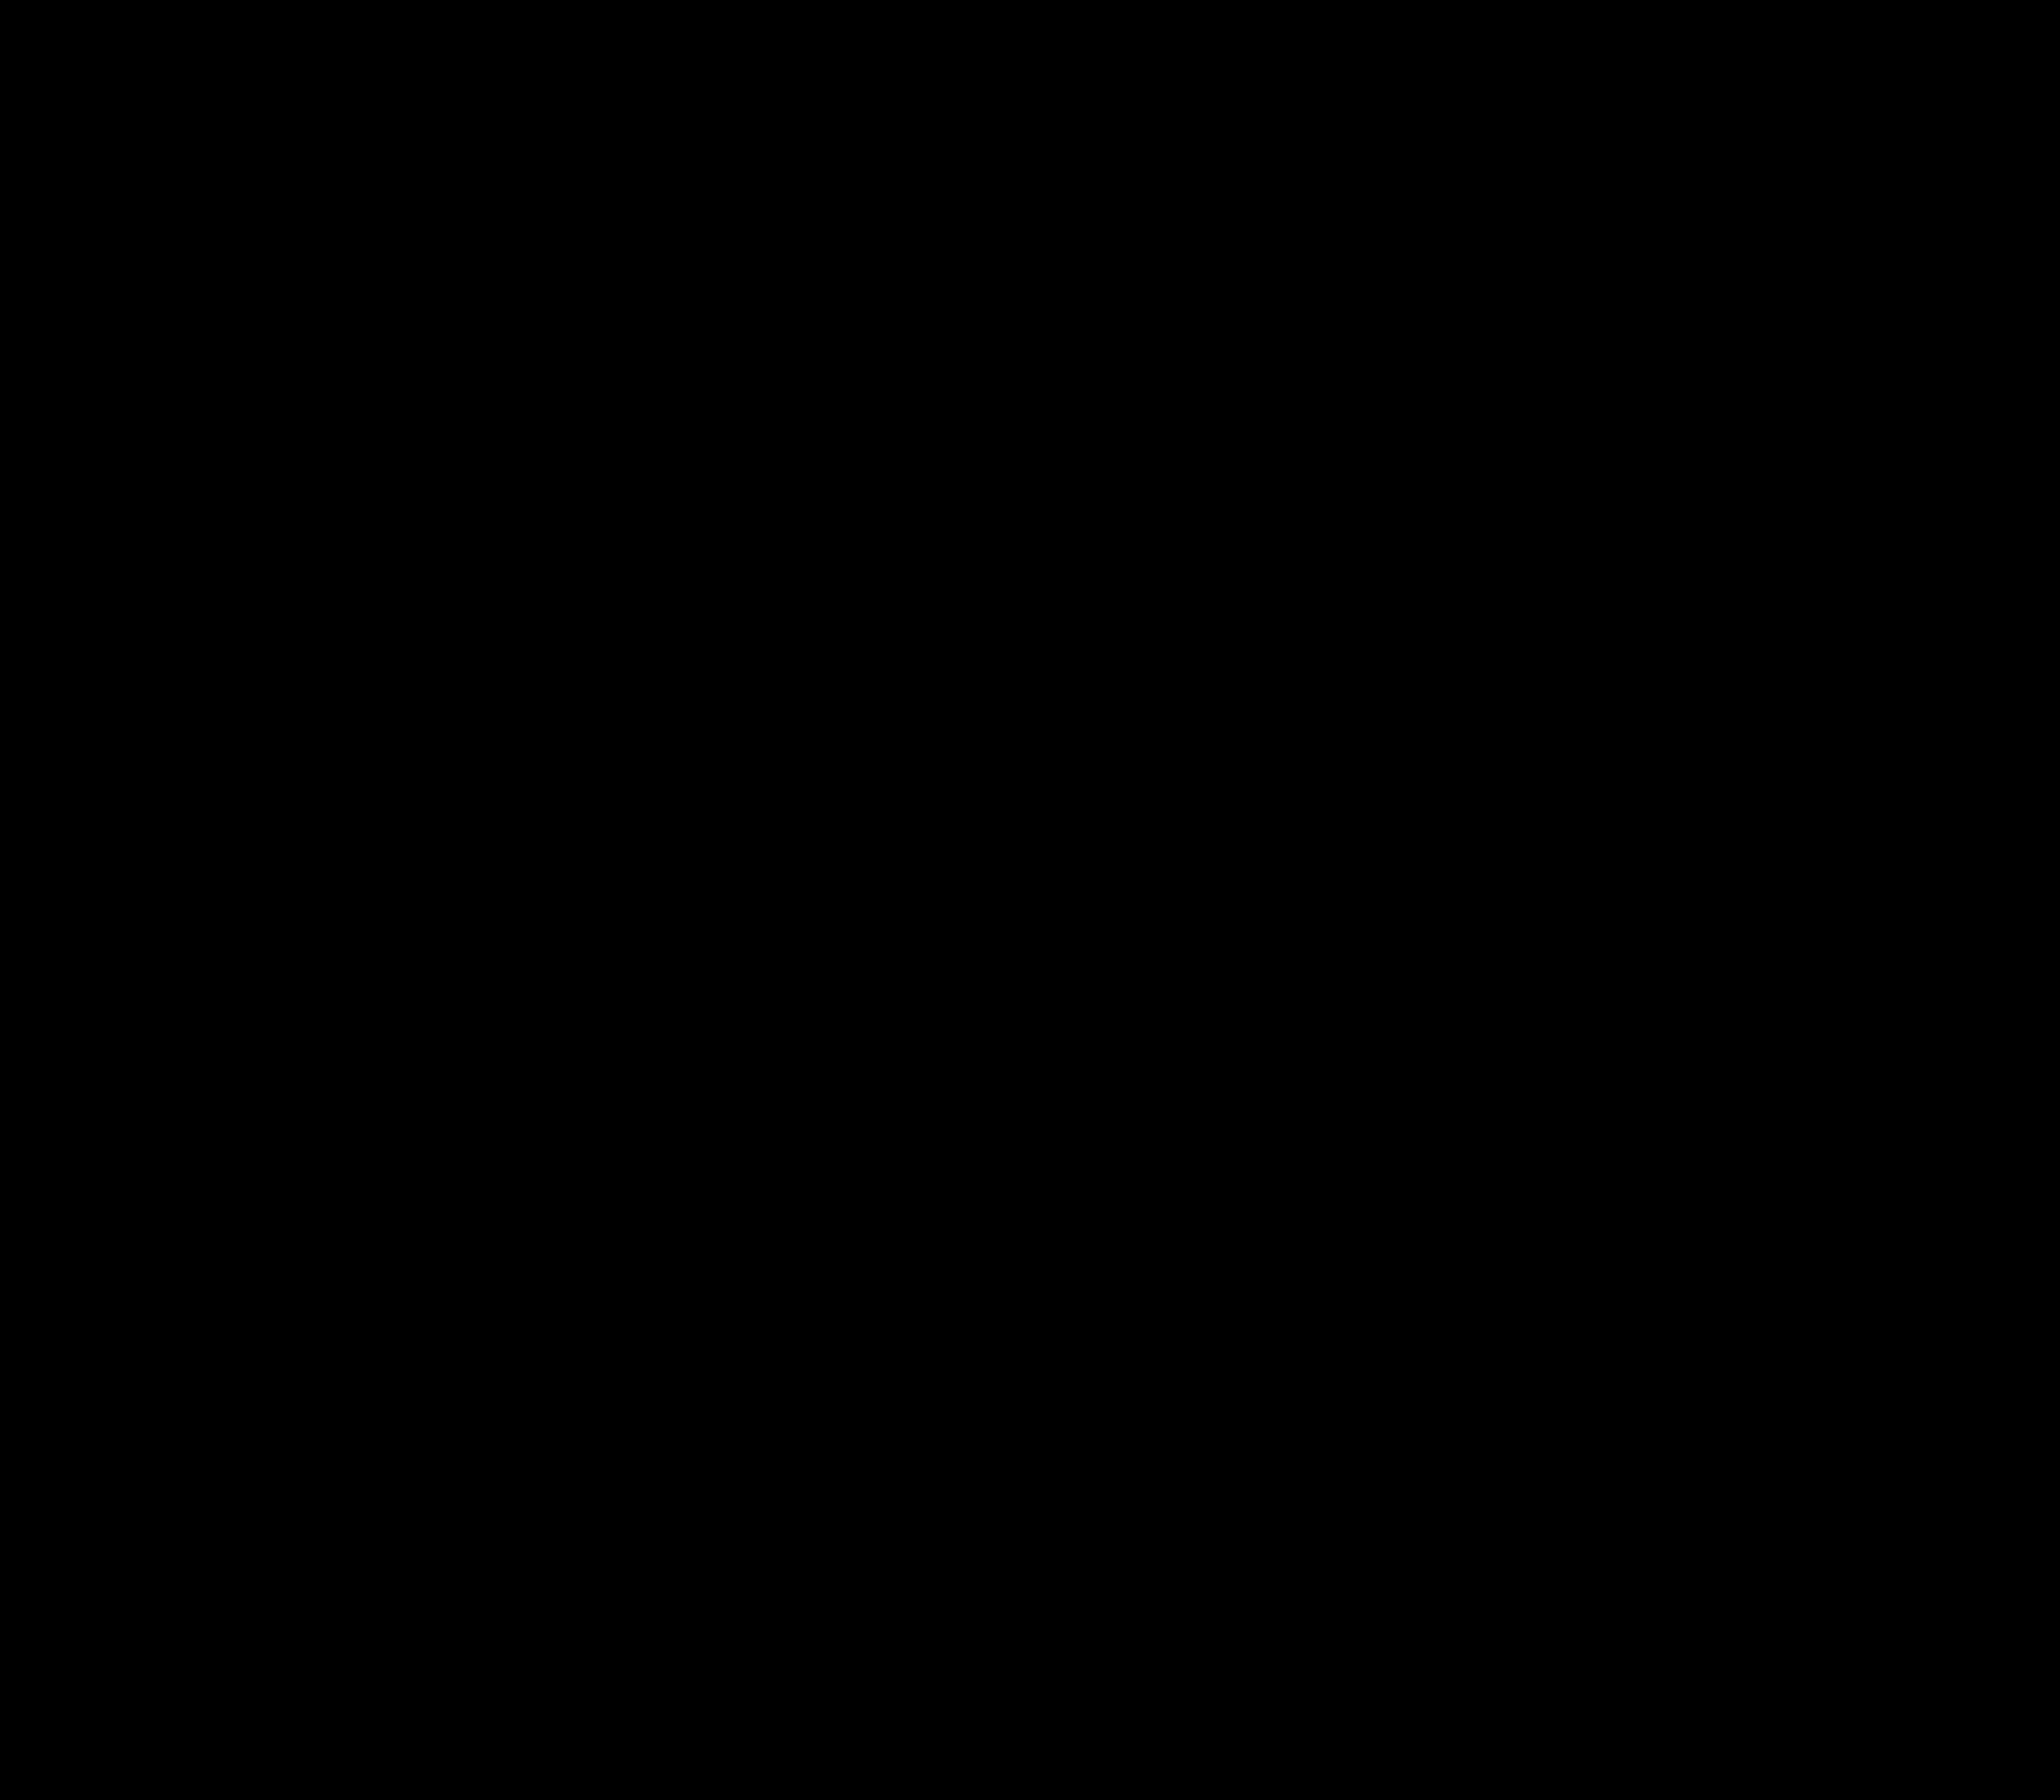 Clipart woman sagittarius. Png transparent images pluspng